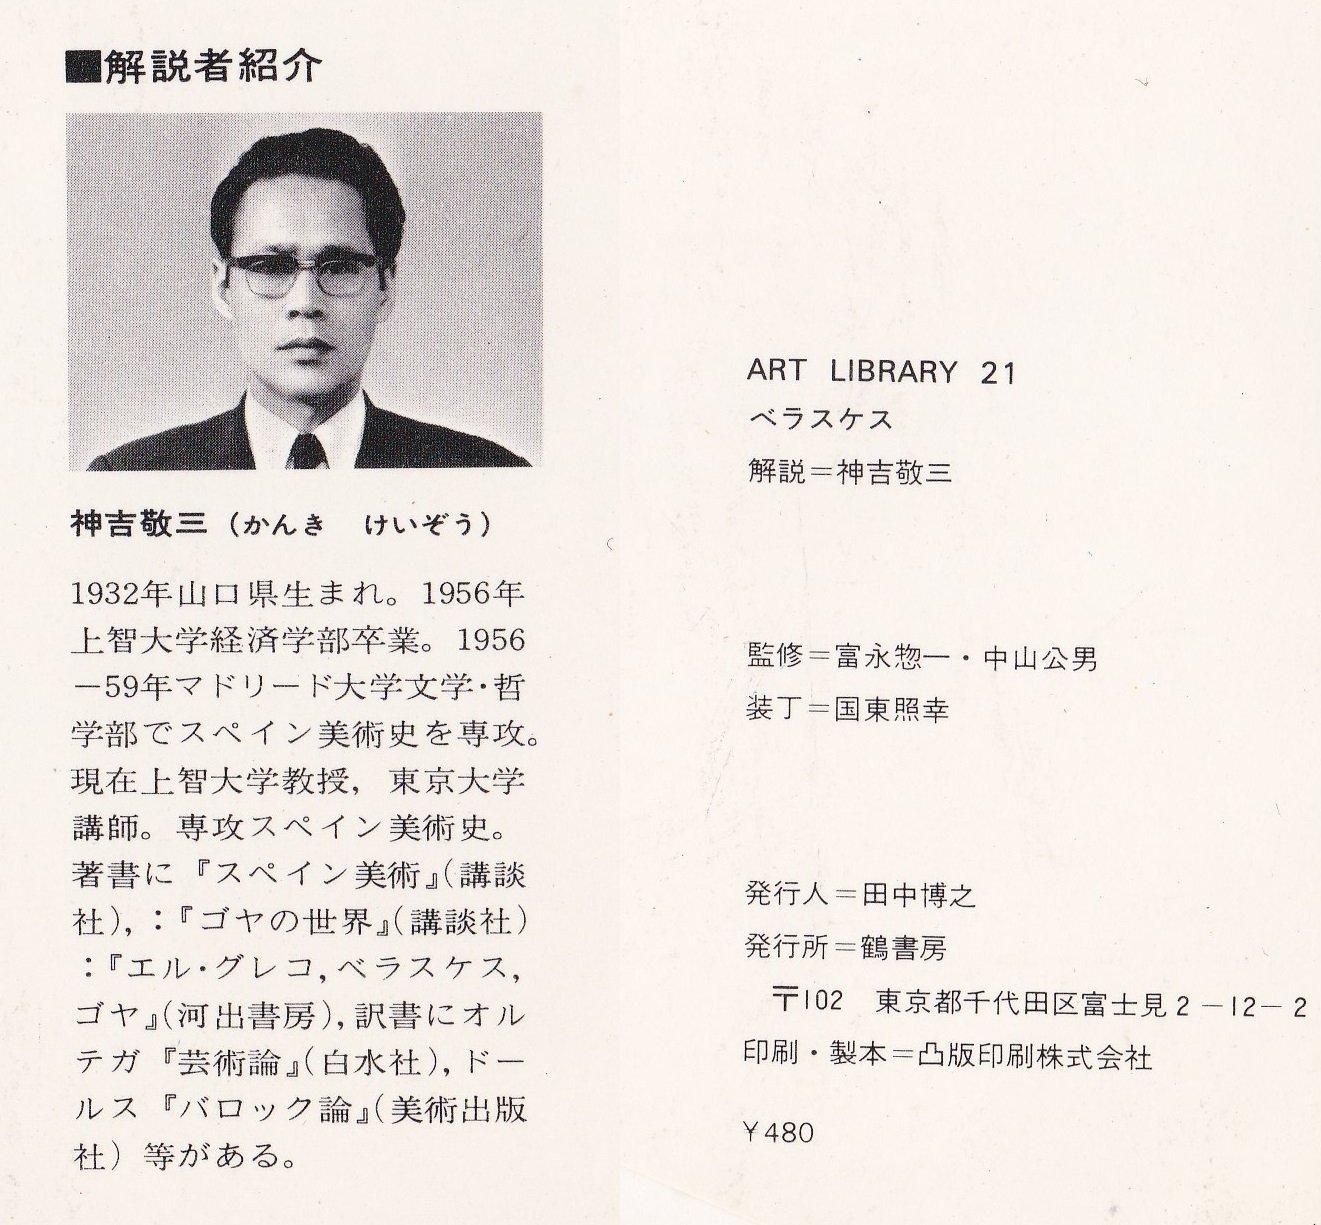 Amazon.co.jp: ベラスケス 応急を描く冷徹な巨匠 生涯と作品解説 ...